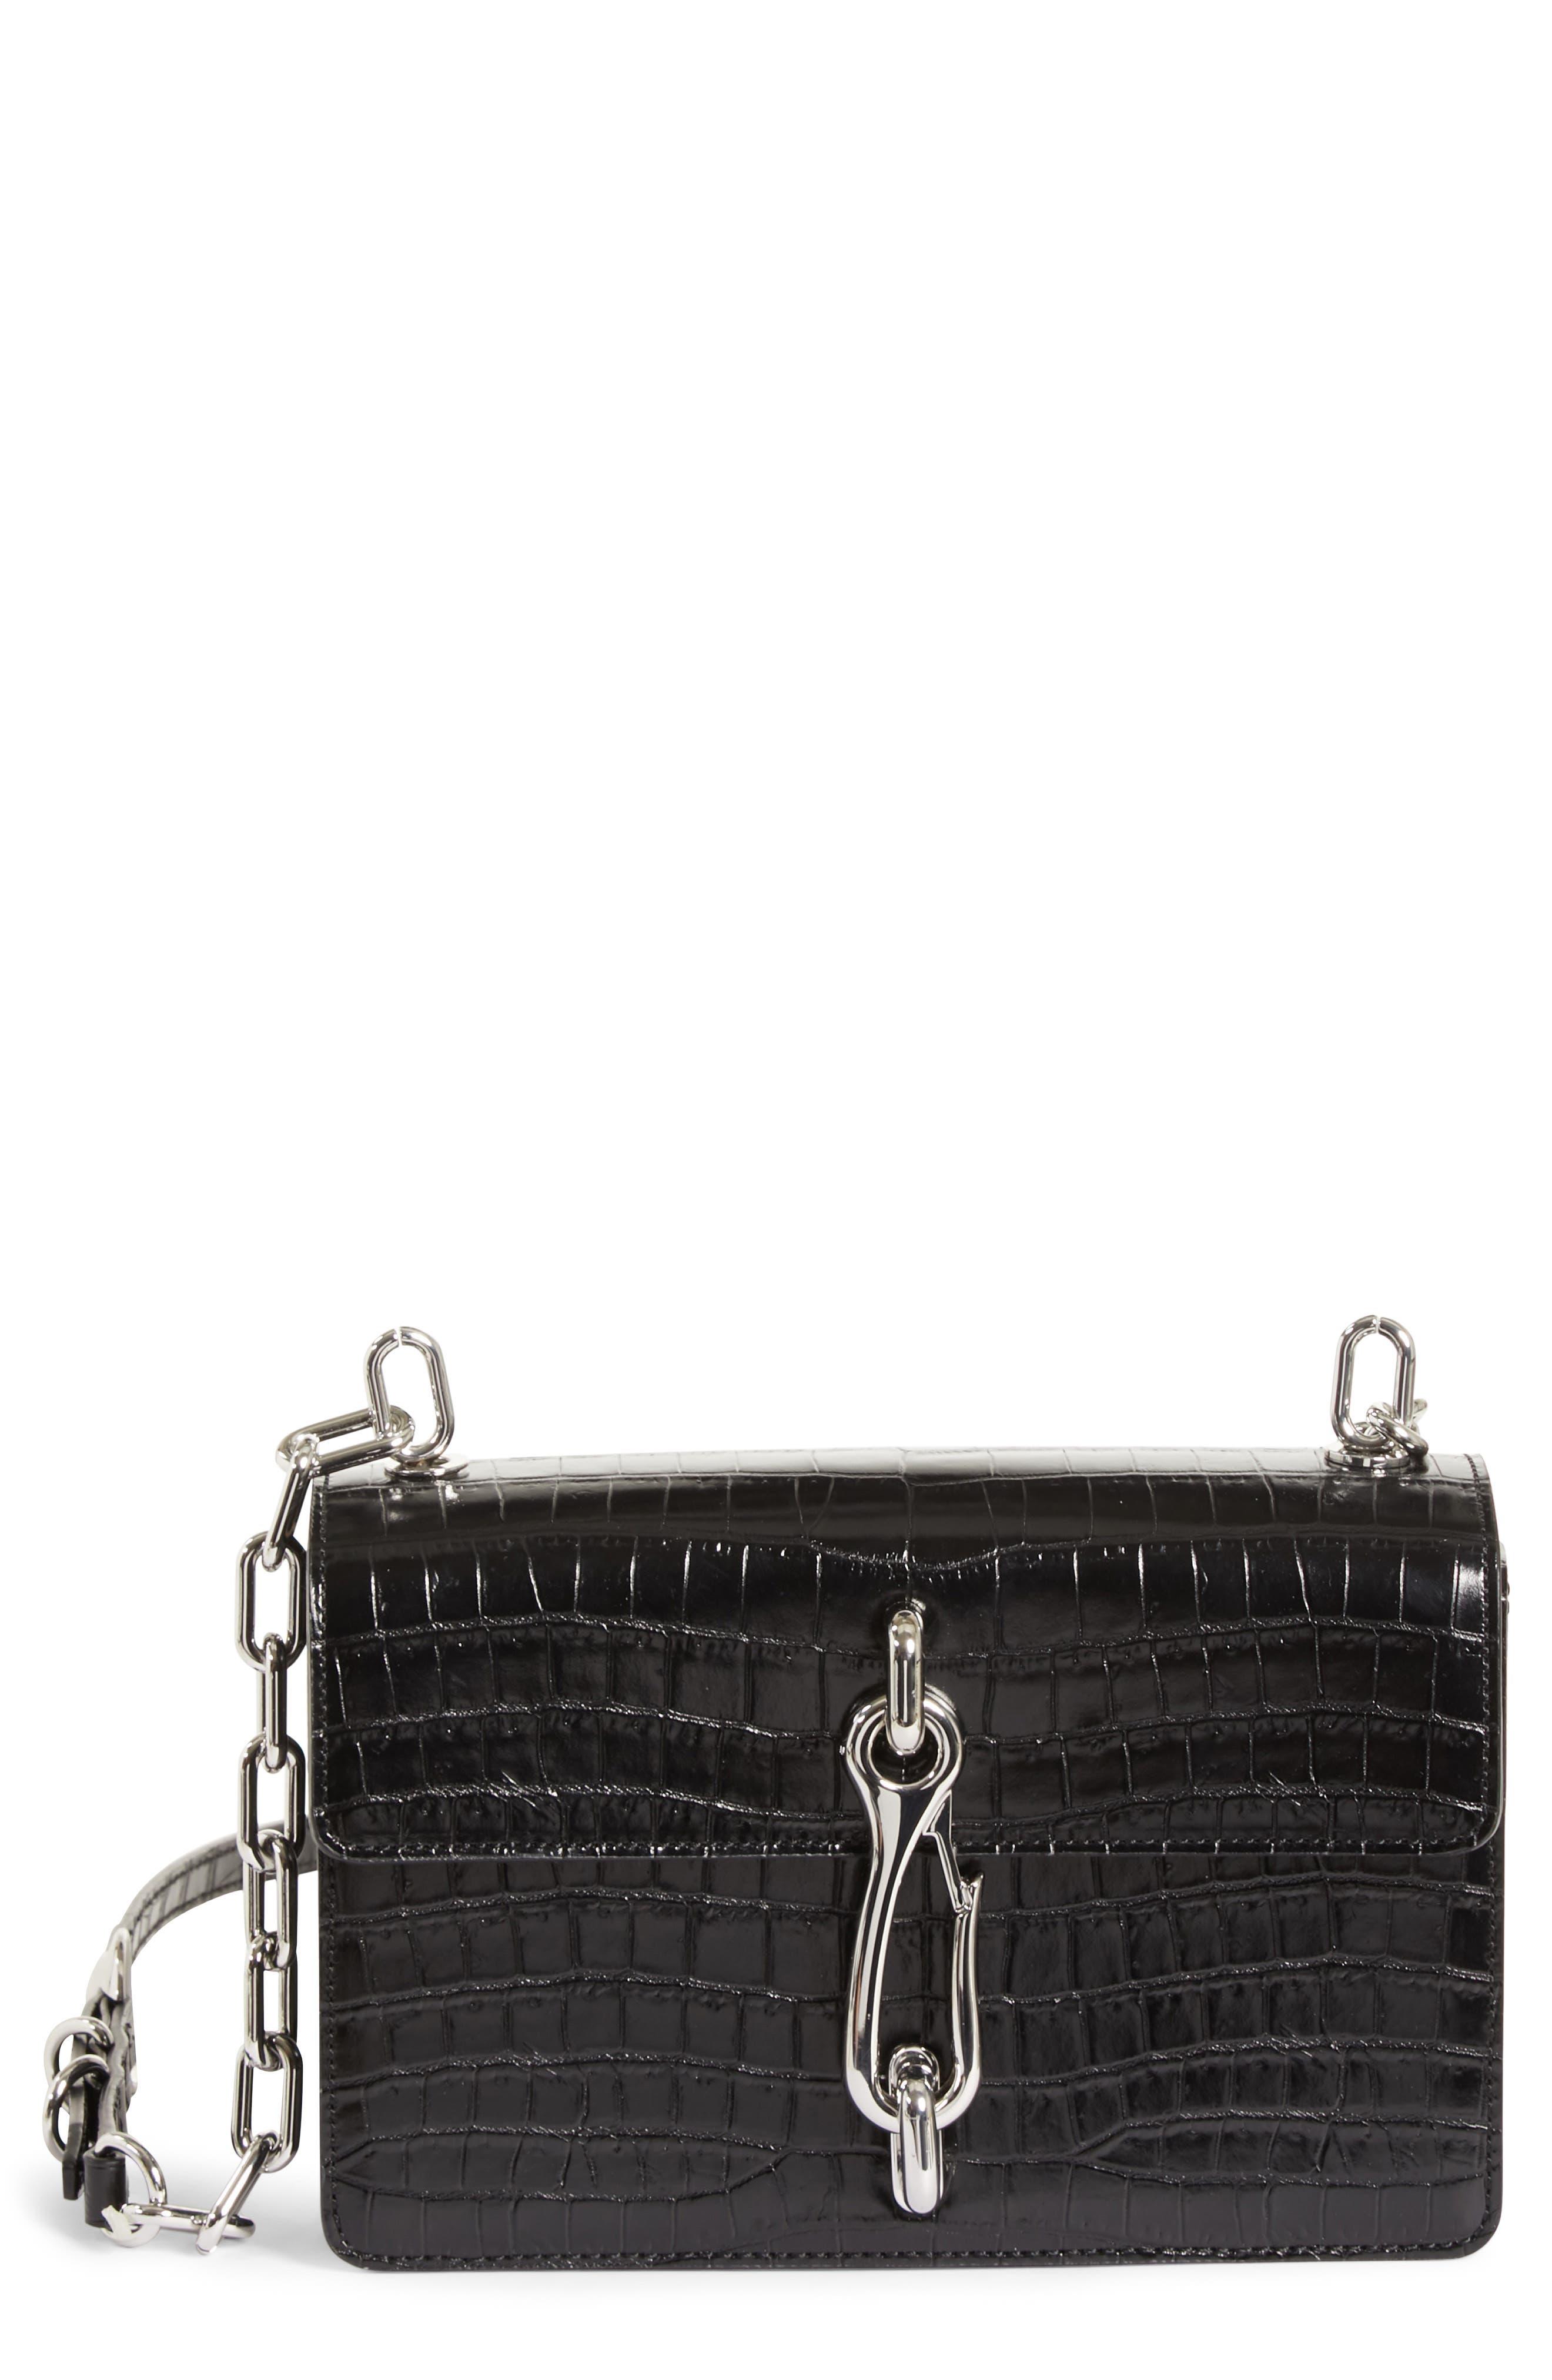 Hook Medium Leather Shoulder/Crossbody Bag,                             Main thumbnail 1, color,                             001